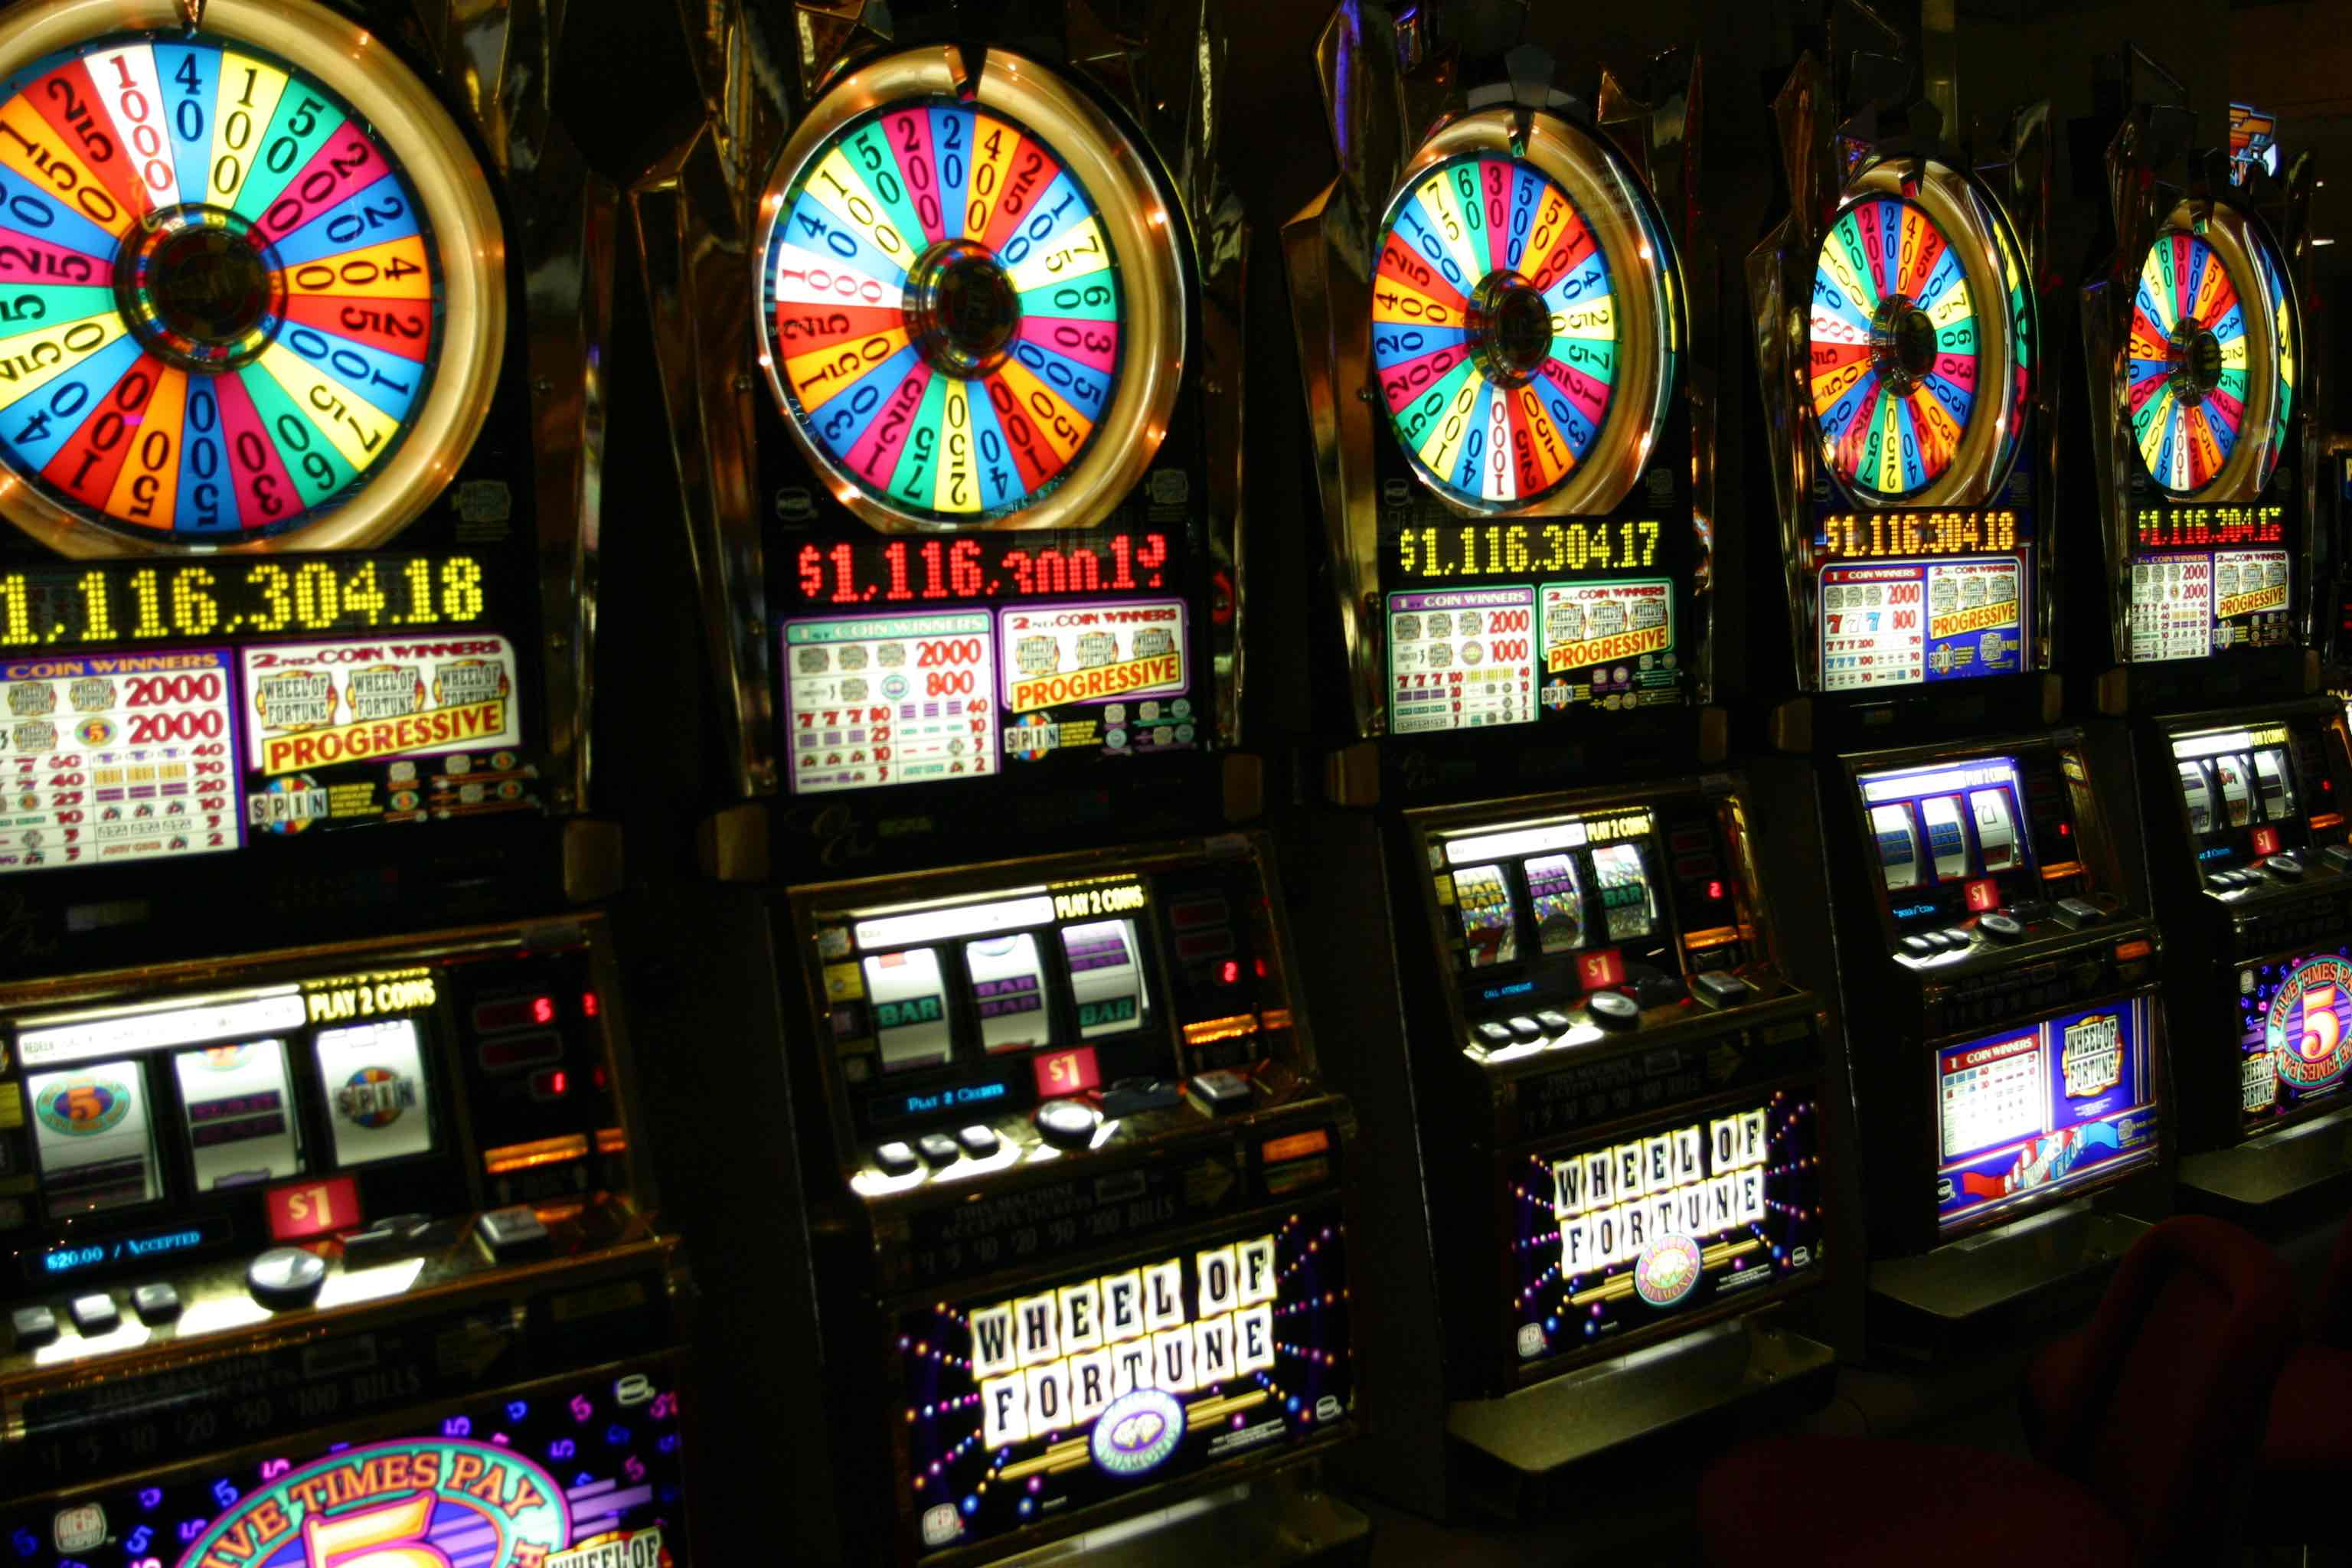 Best slot machine - 93121